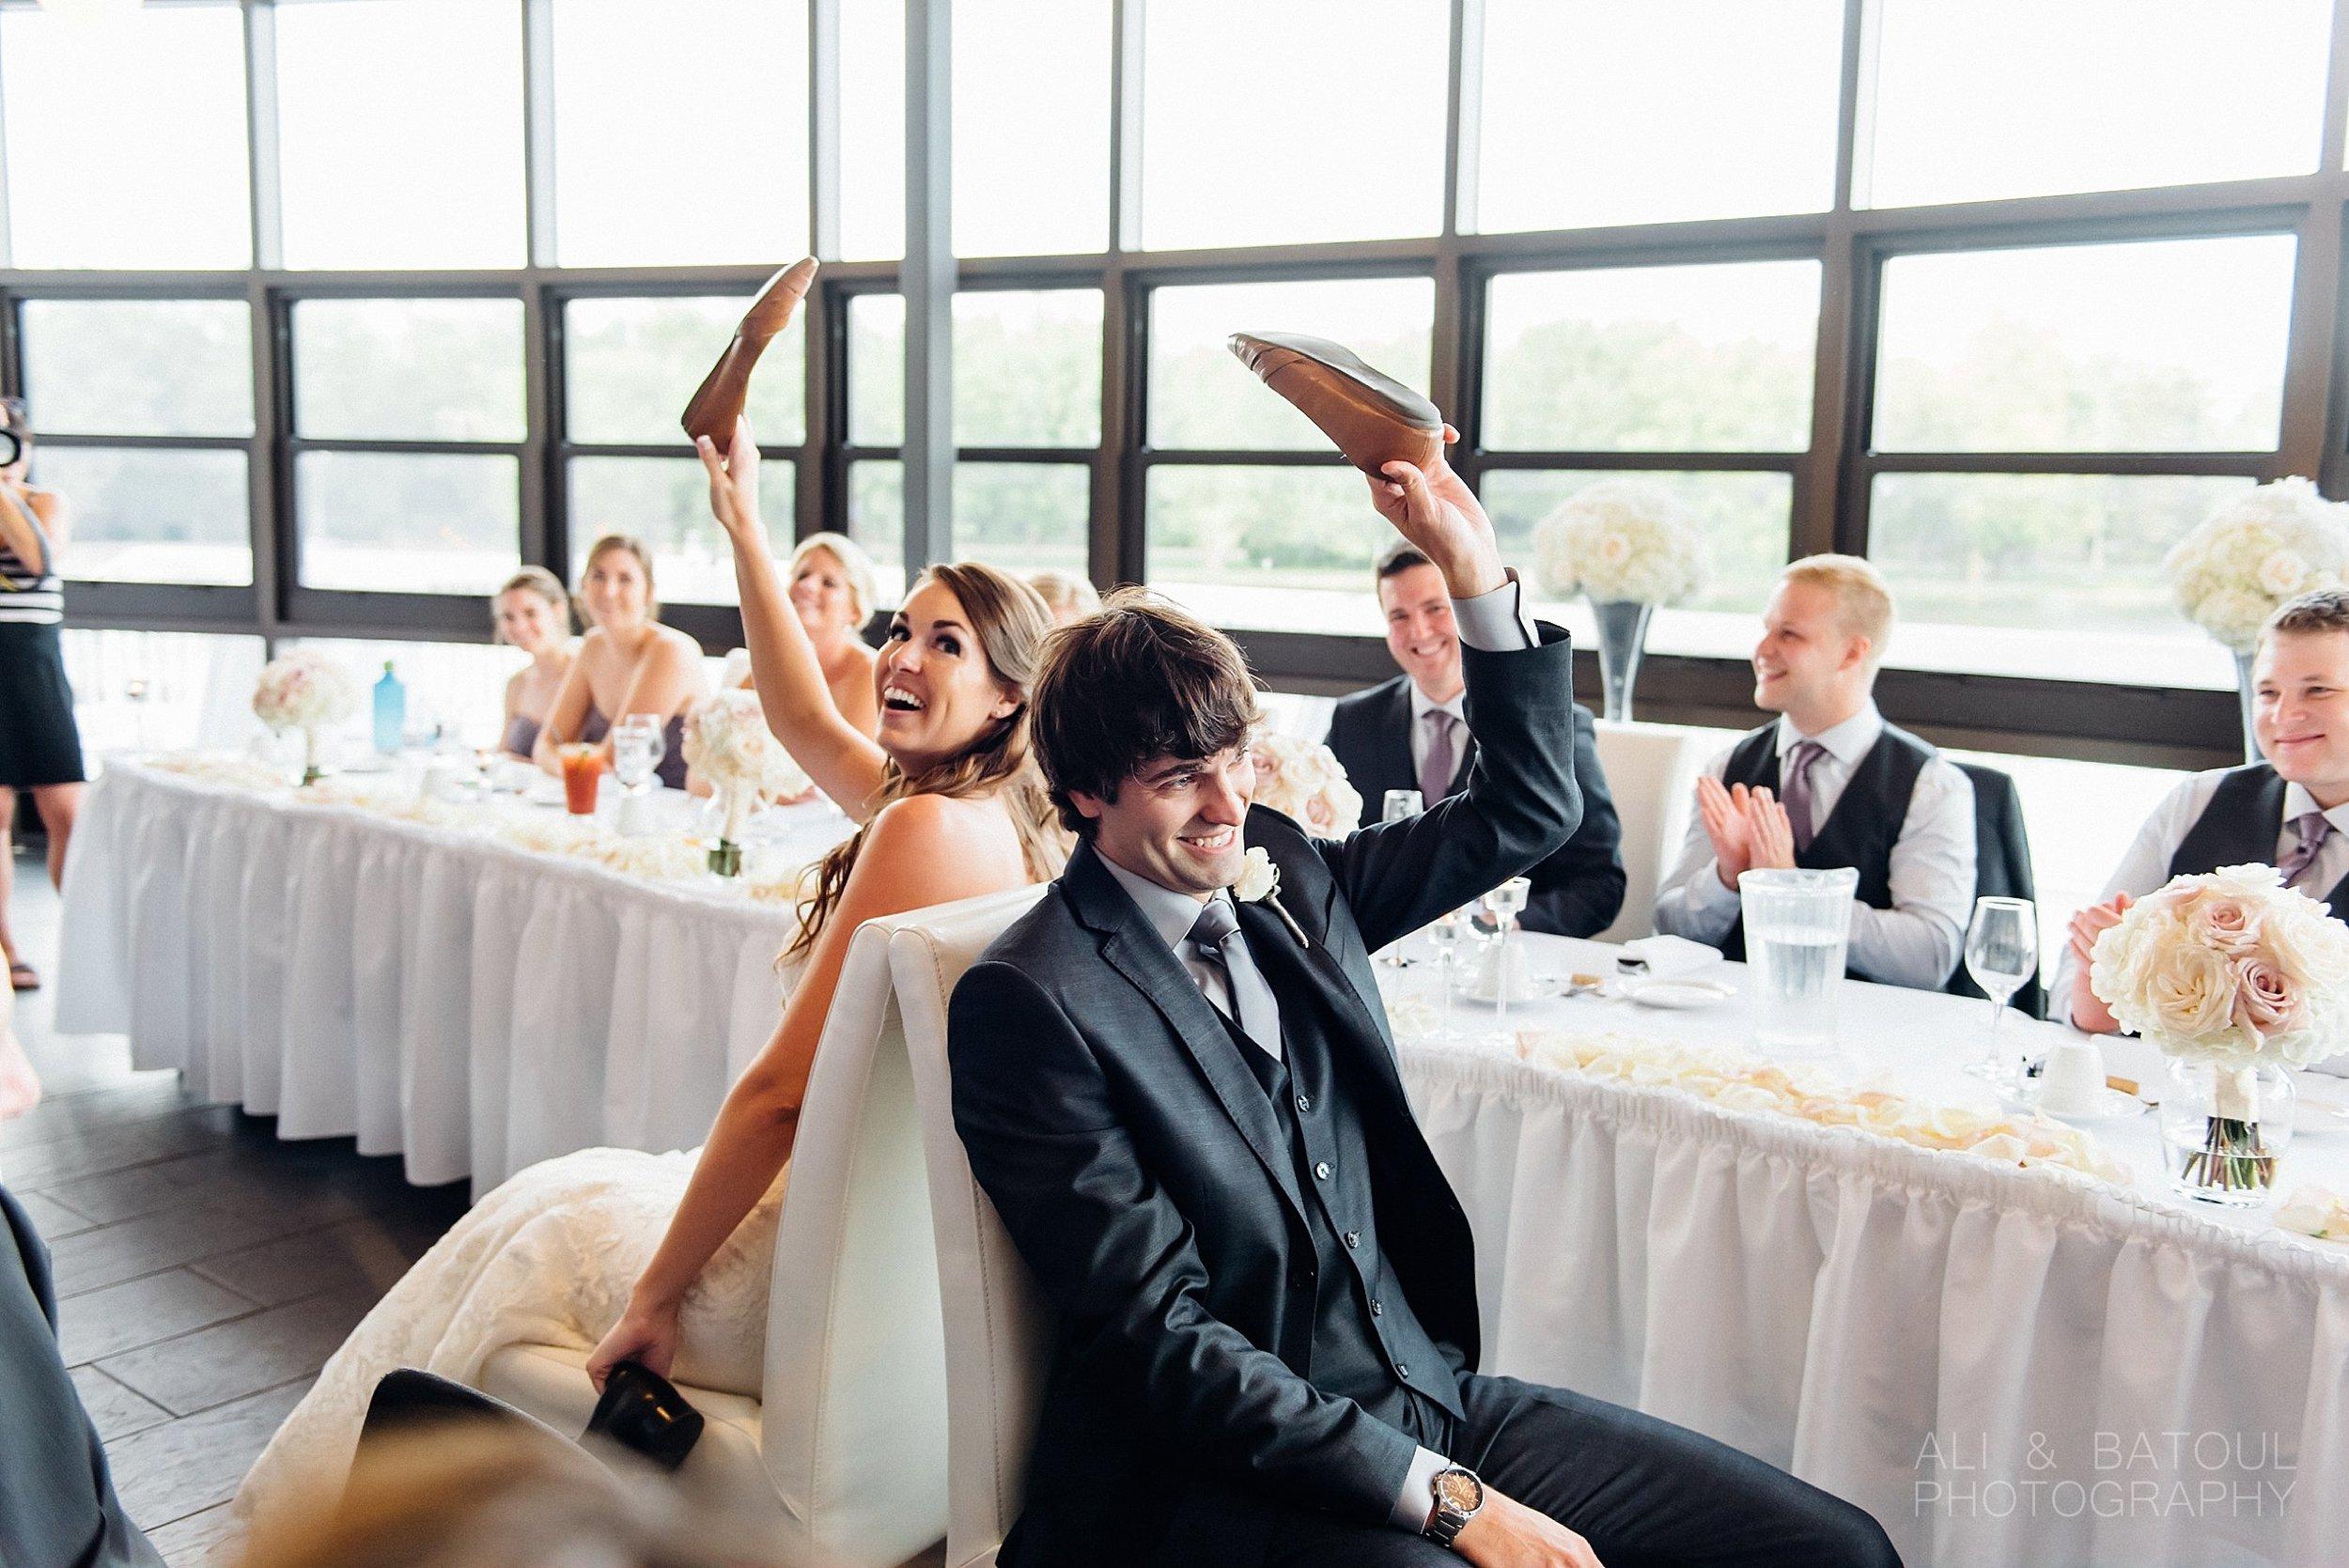 Ali & Batoul Photography - Documentary Fine Art Ottawa Wedding Photography_0079.jpg